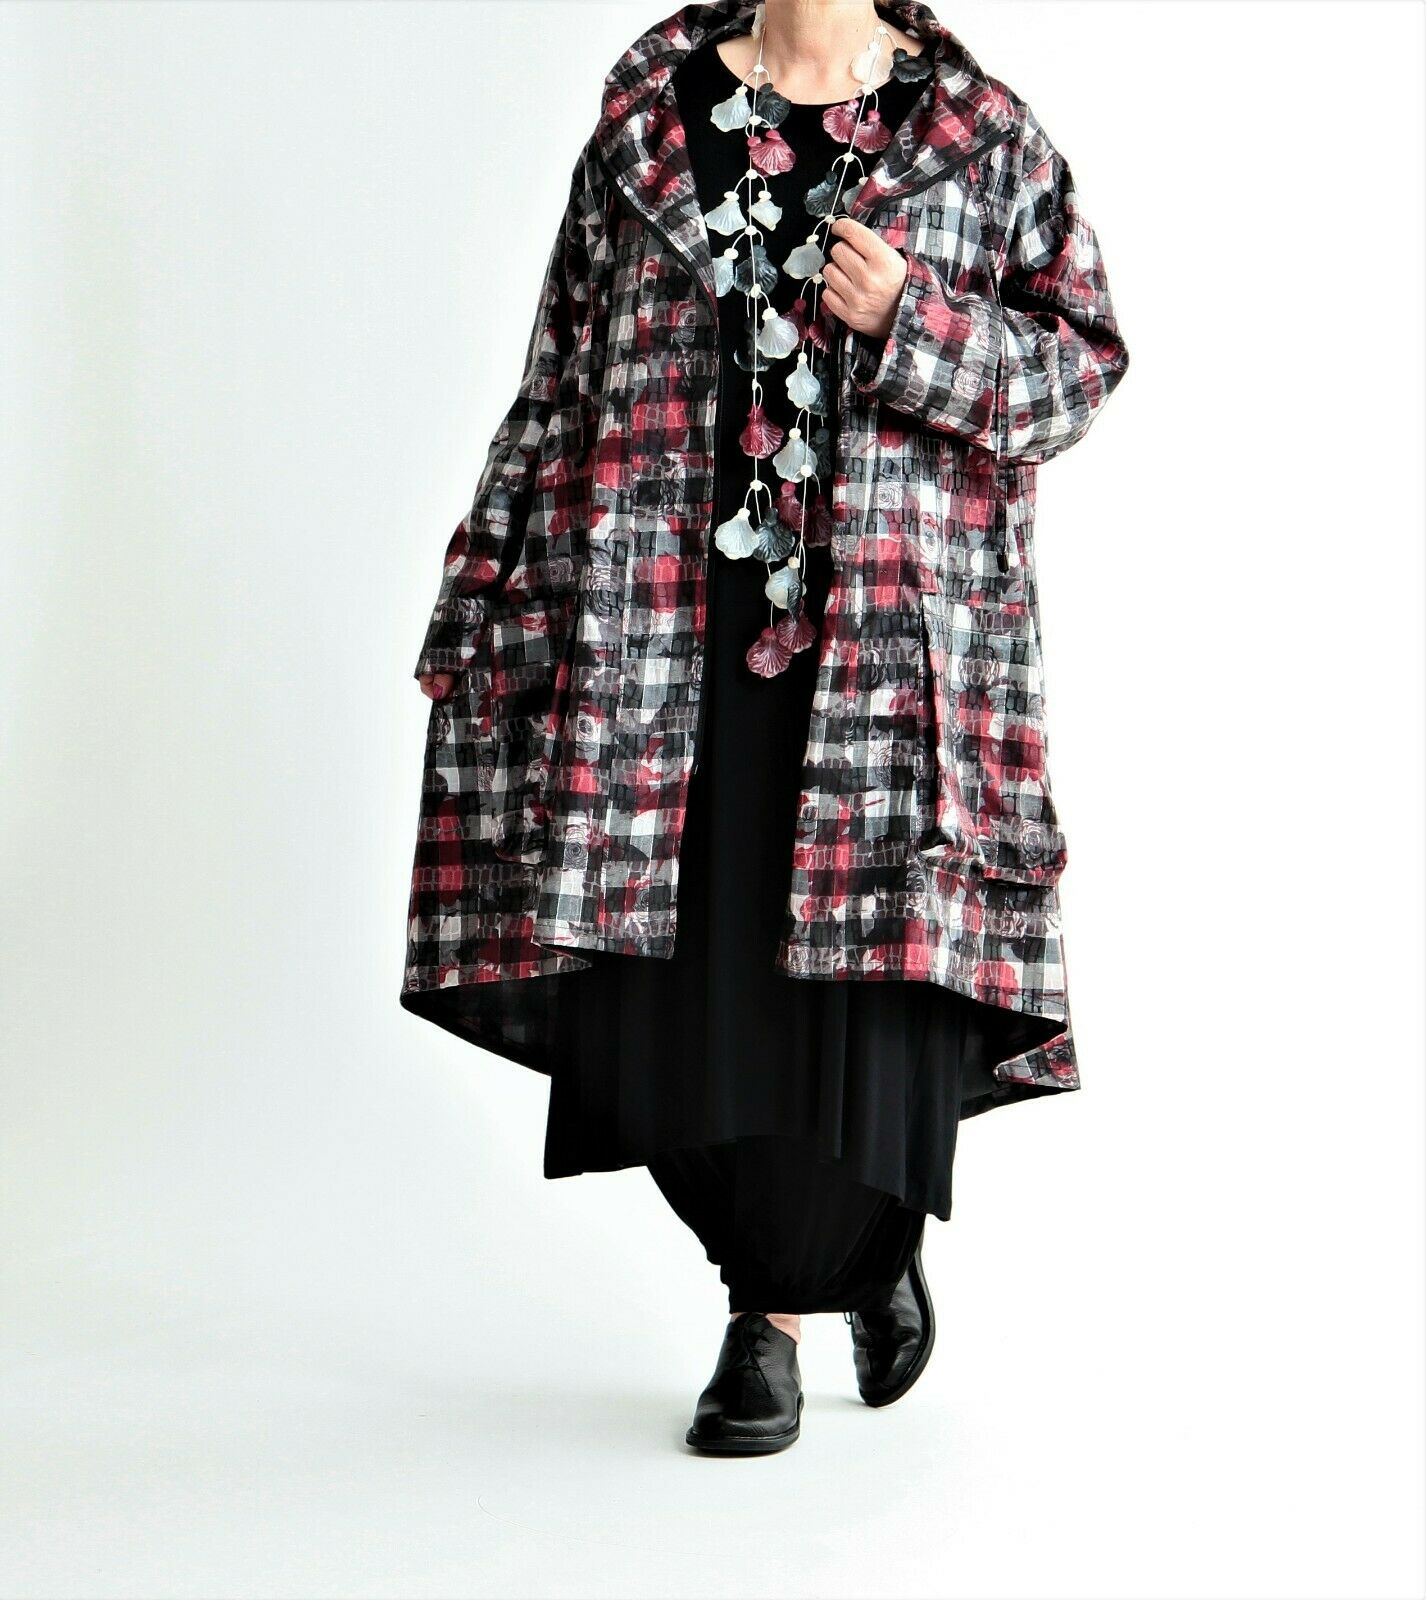 9e55444235c097 3 Farben AKH Fashion Mantel Taft Gr. ♢  44,46,48,50,52,54,56,58,60,62,Blaumen nucirq9296-Mäntel & Westen